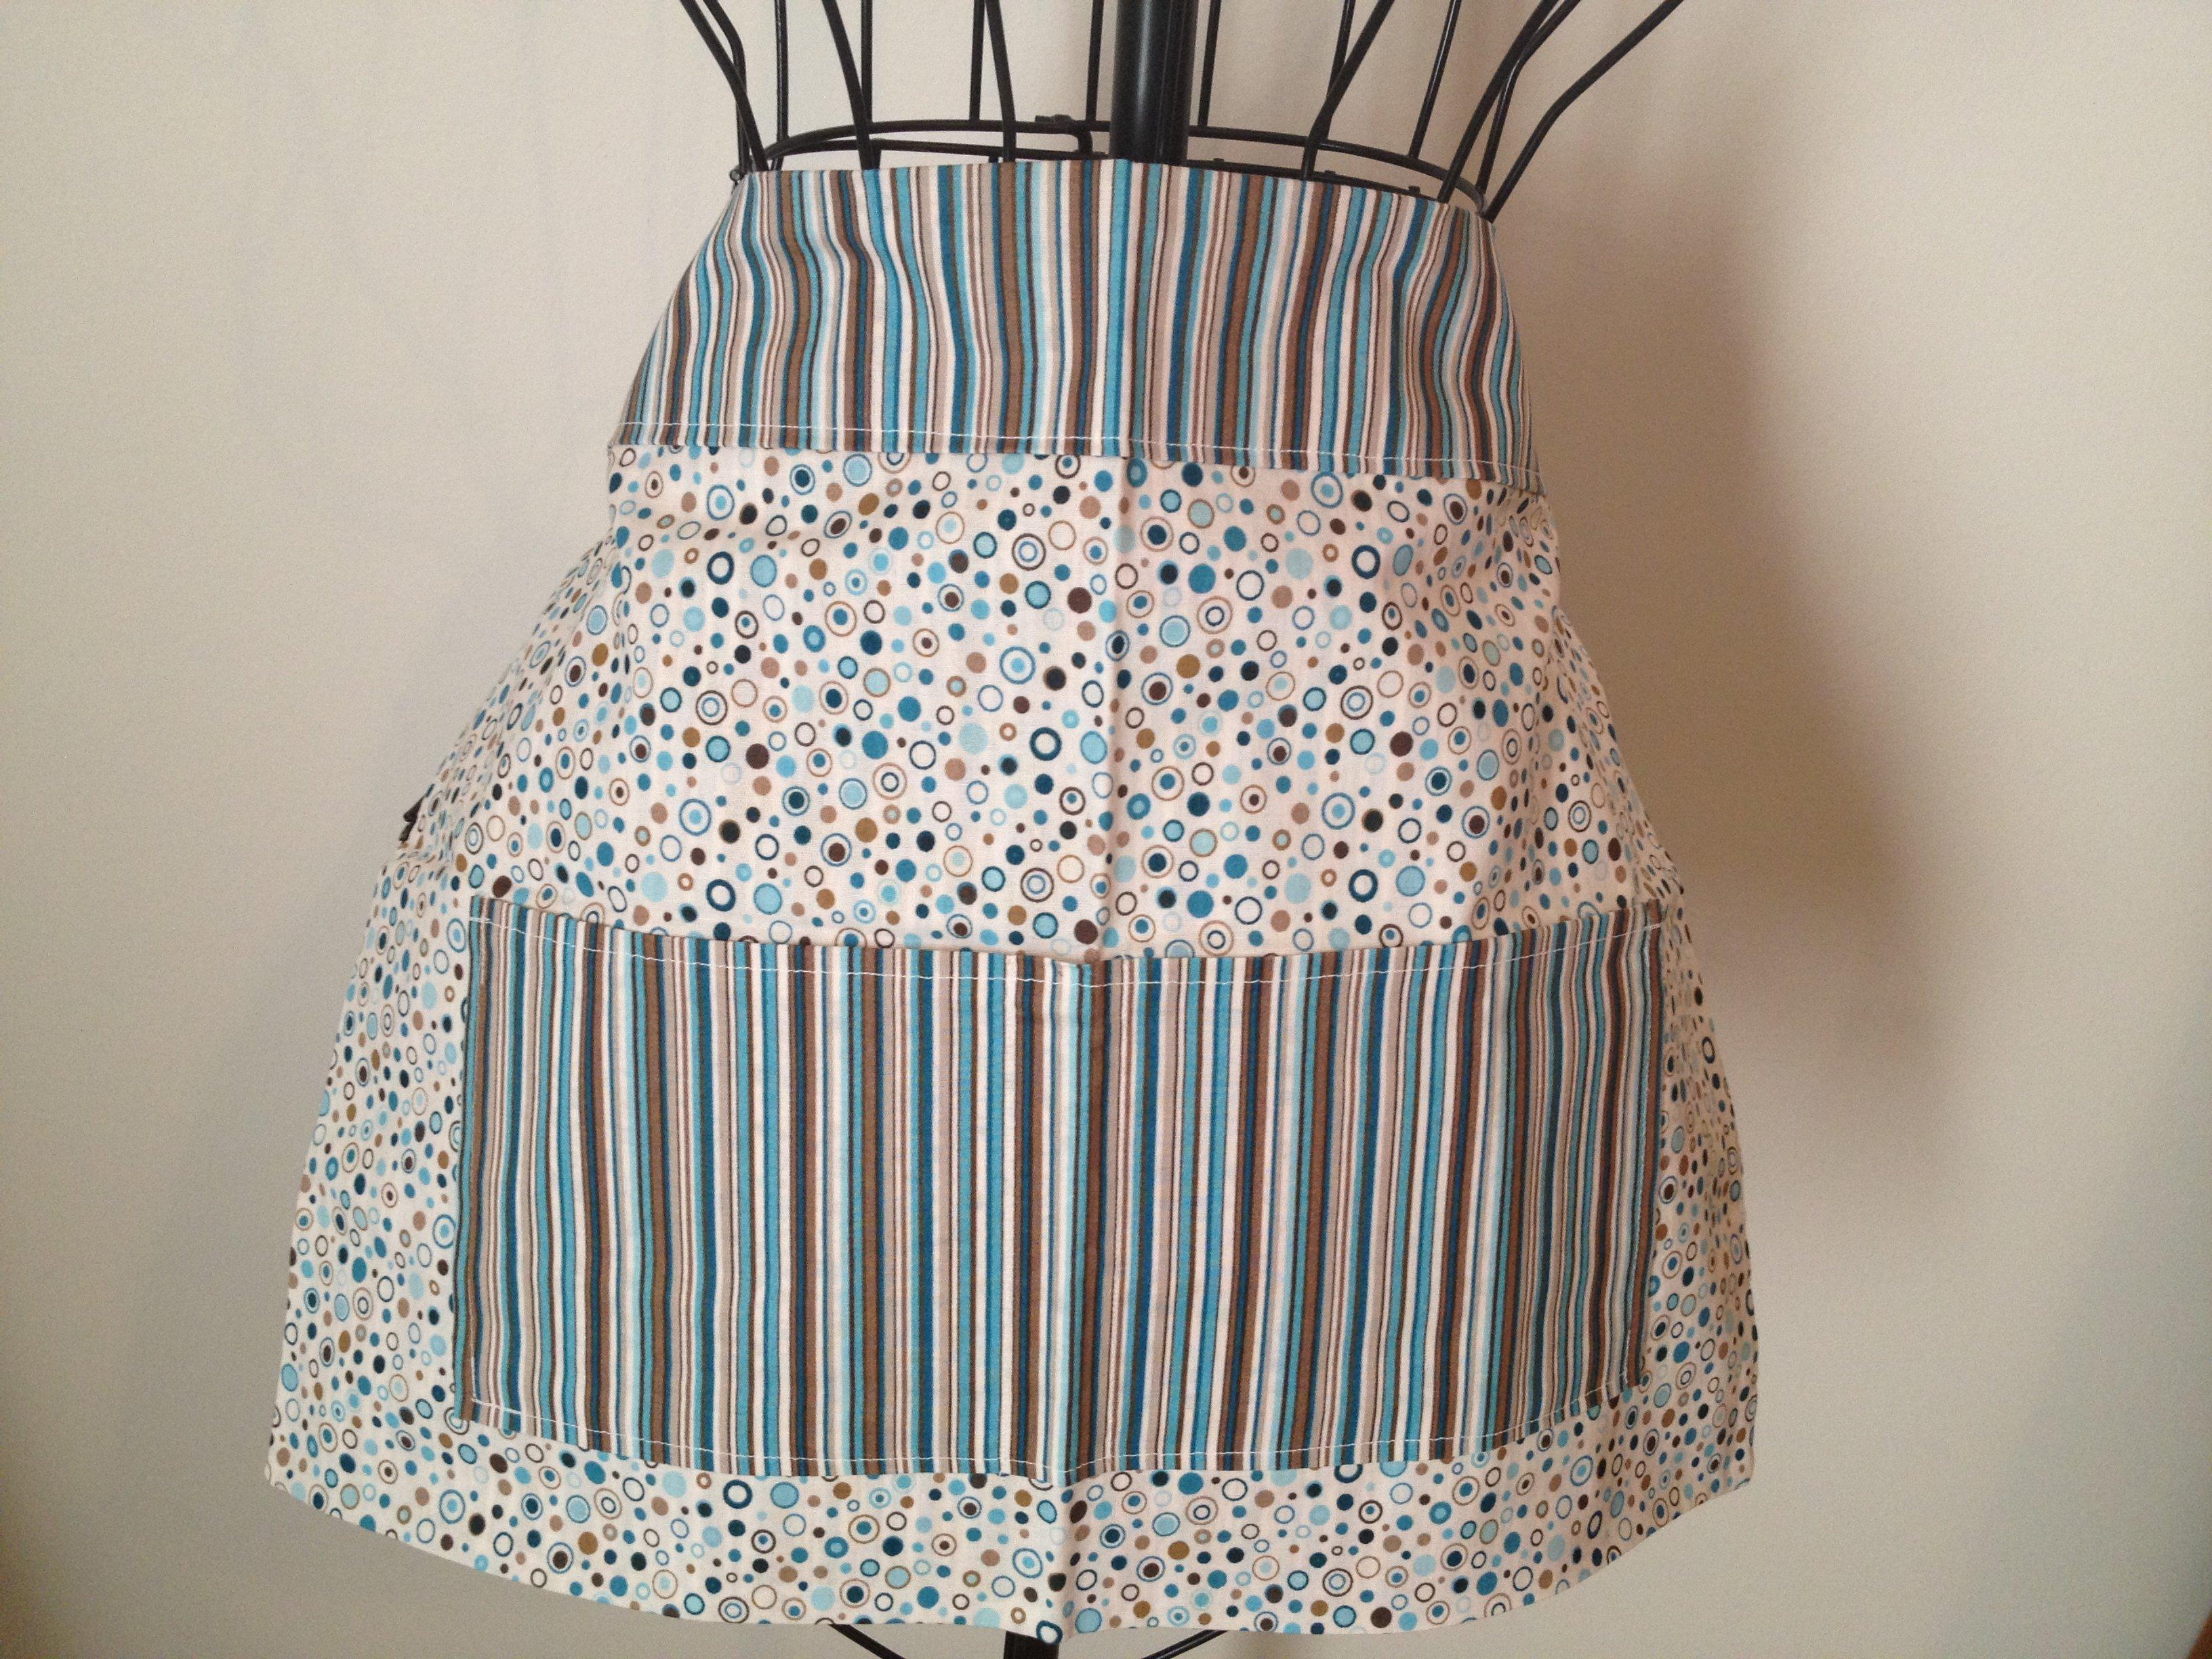 Circles & Stripes apron – love it!